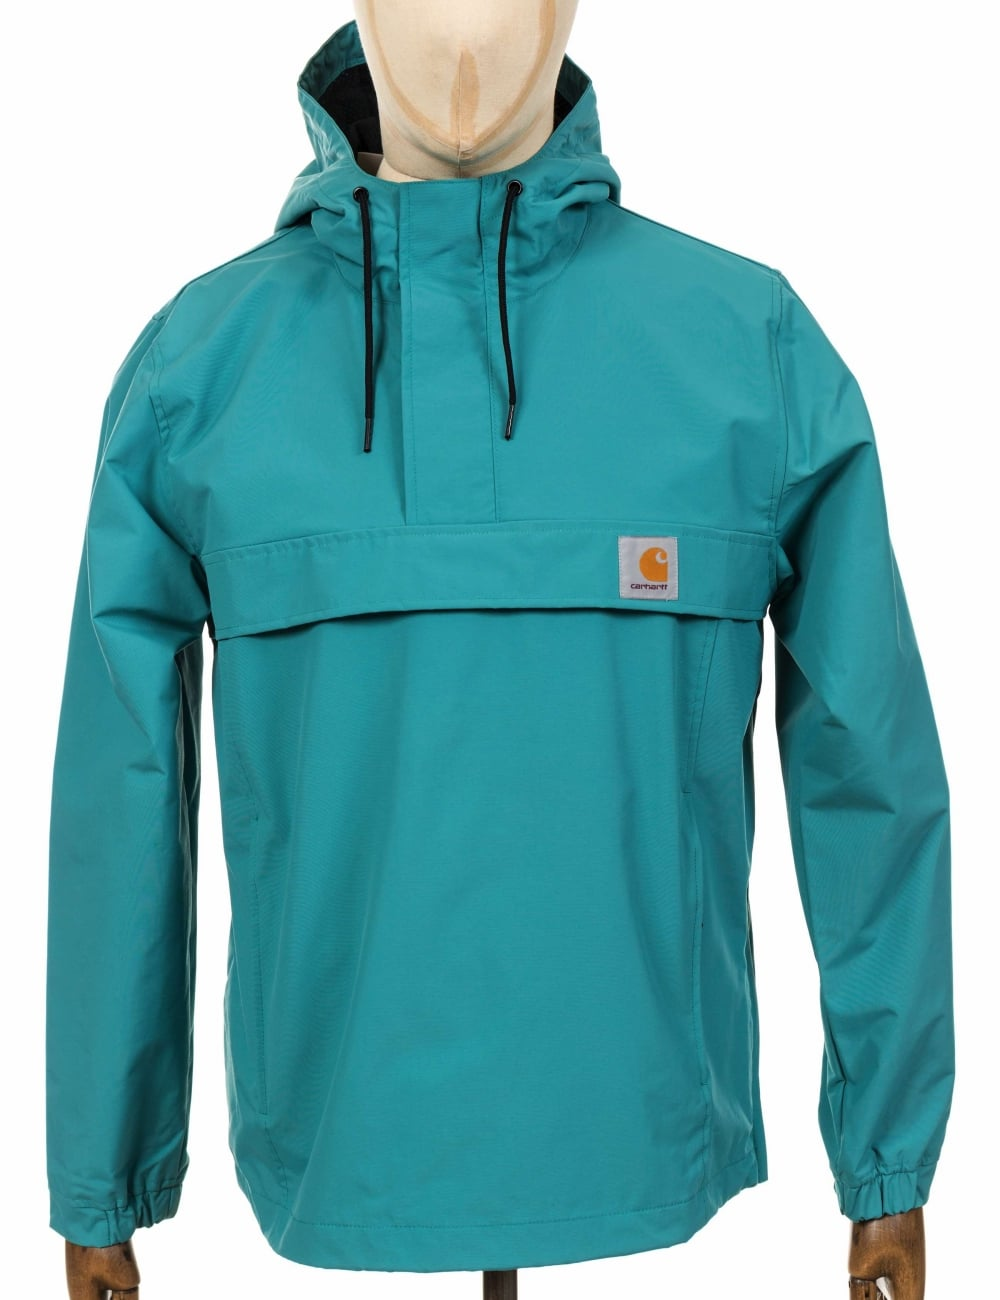 3e52bd3eddc Carhartt WIP Nimbus Pullover Jacket - Soft Teal - Jackets from Fat ...